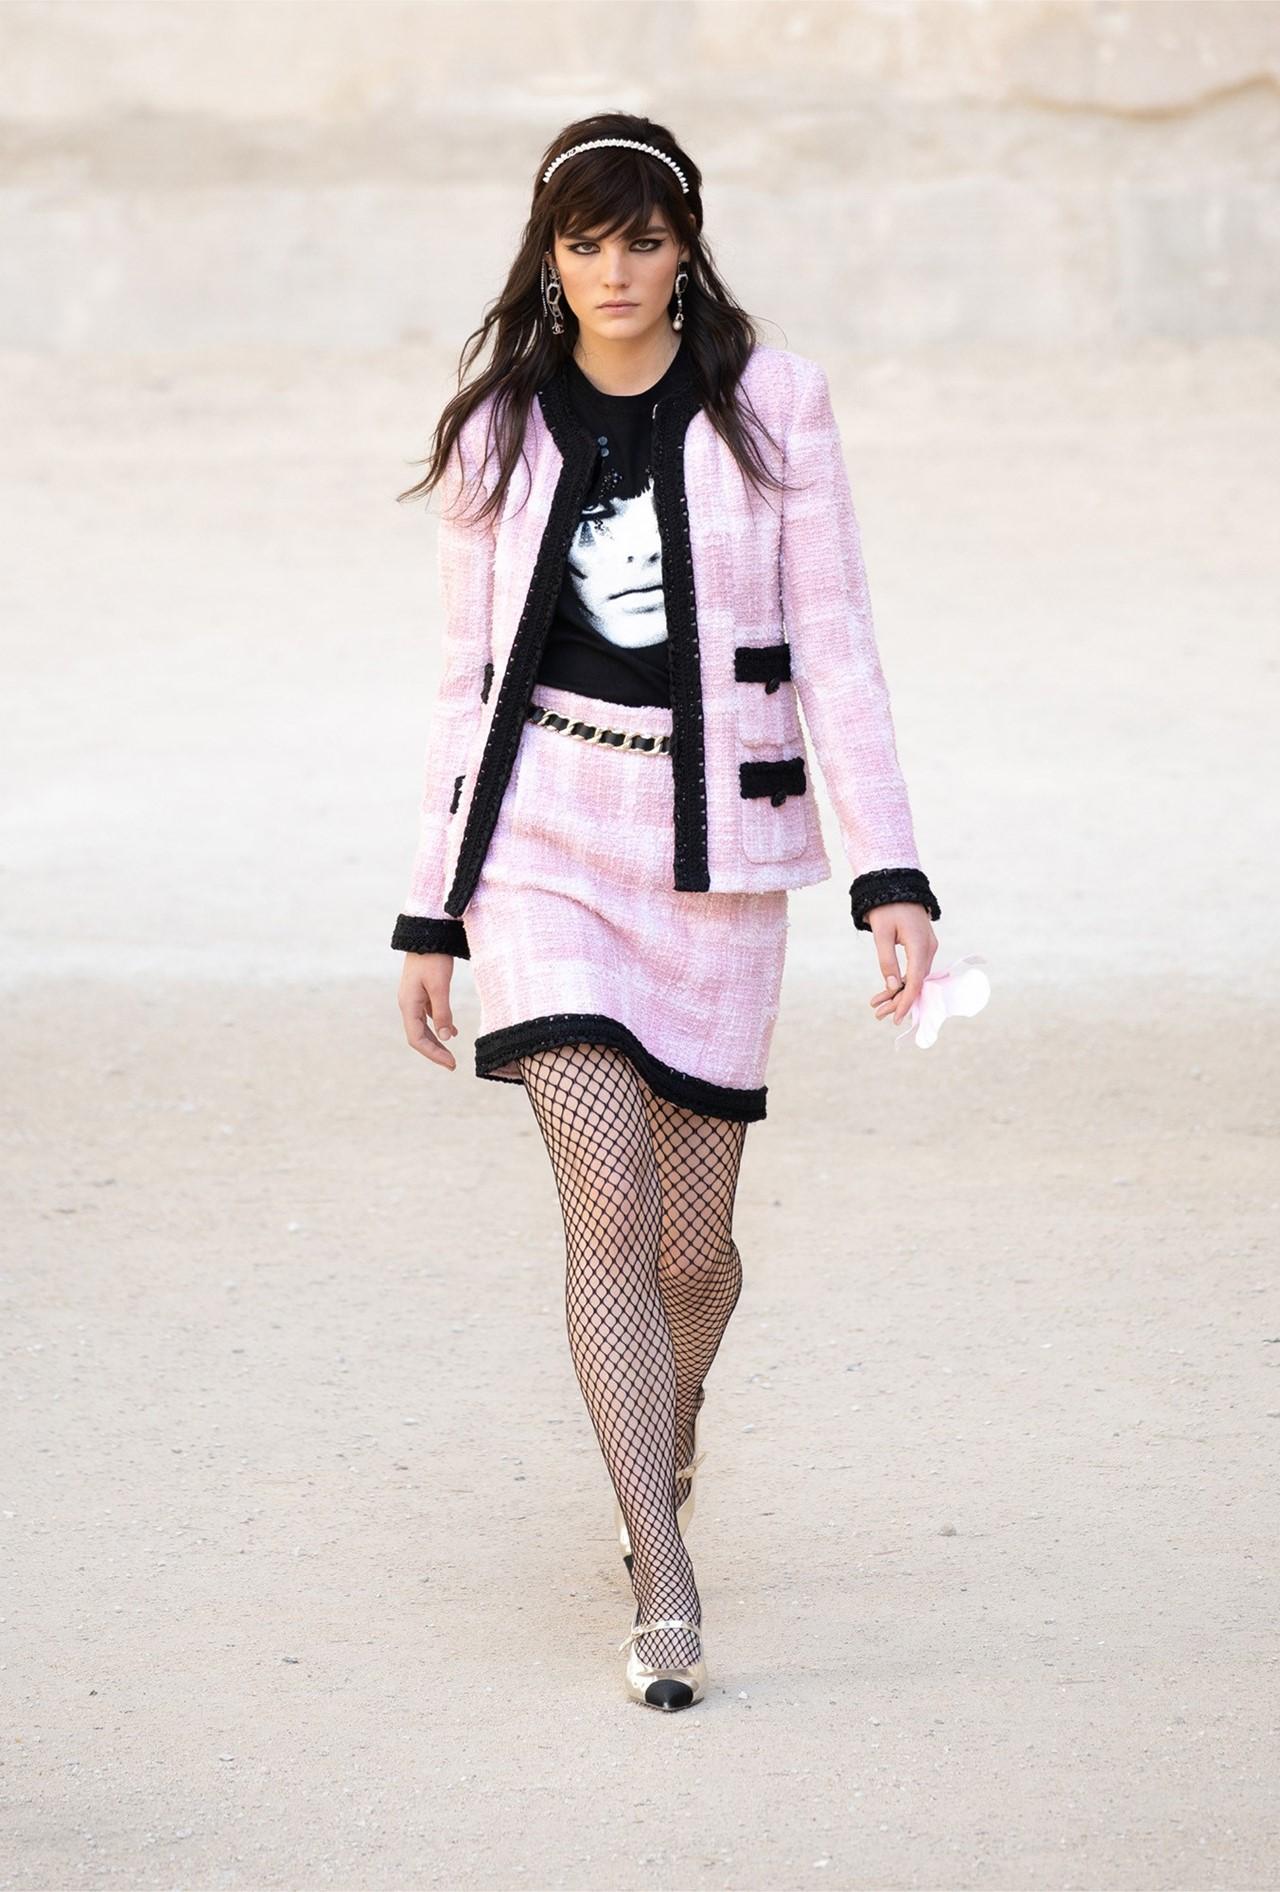 Chanel_Cruise_2022_Fashionela (12)